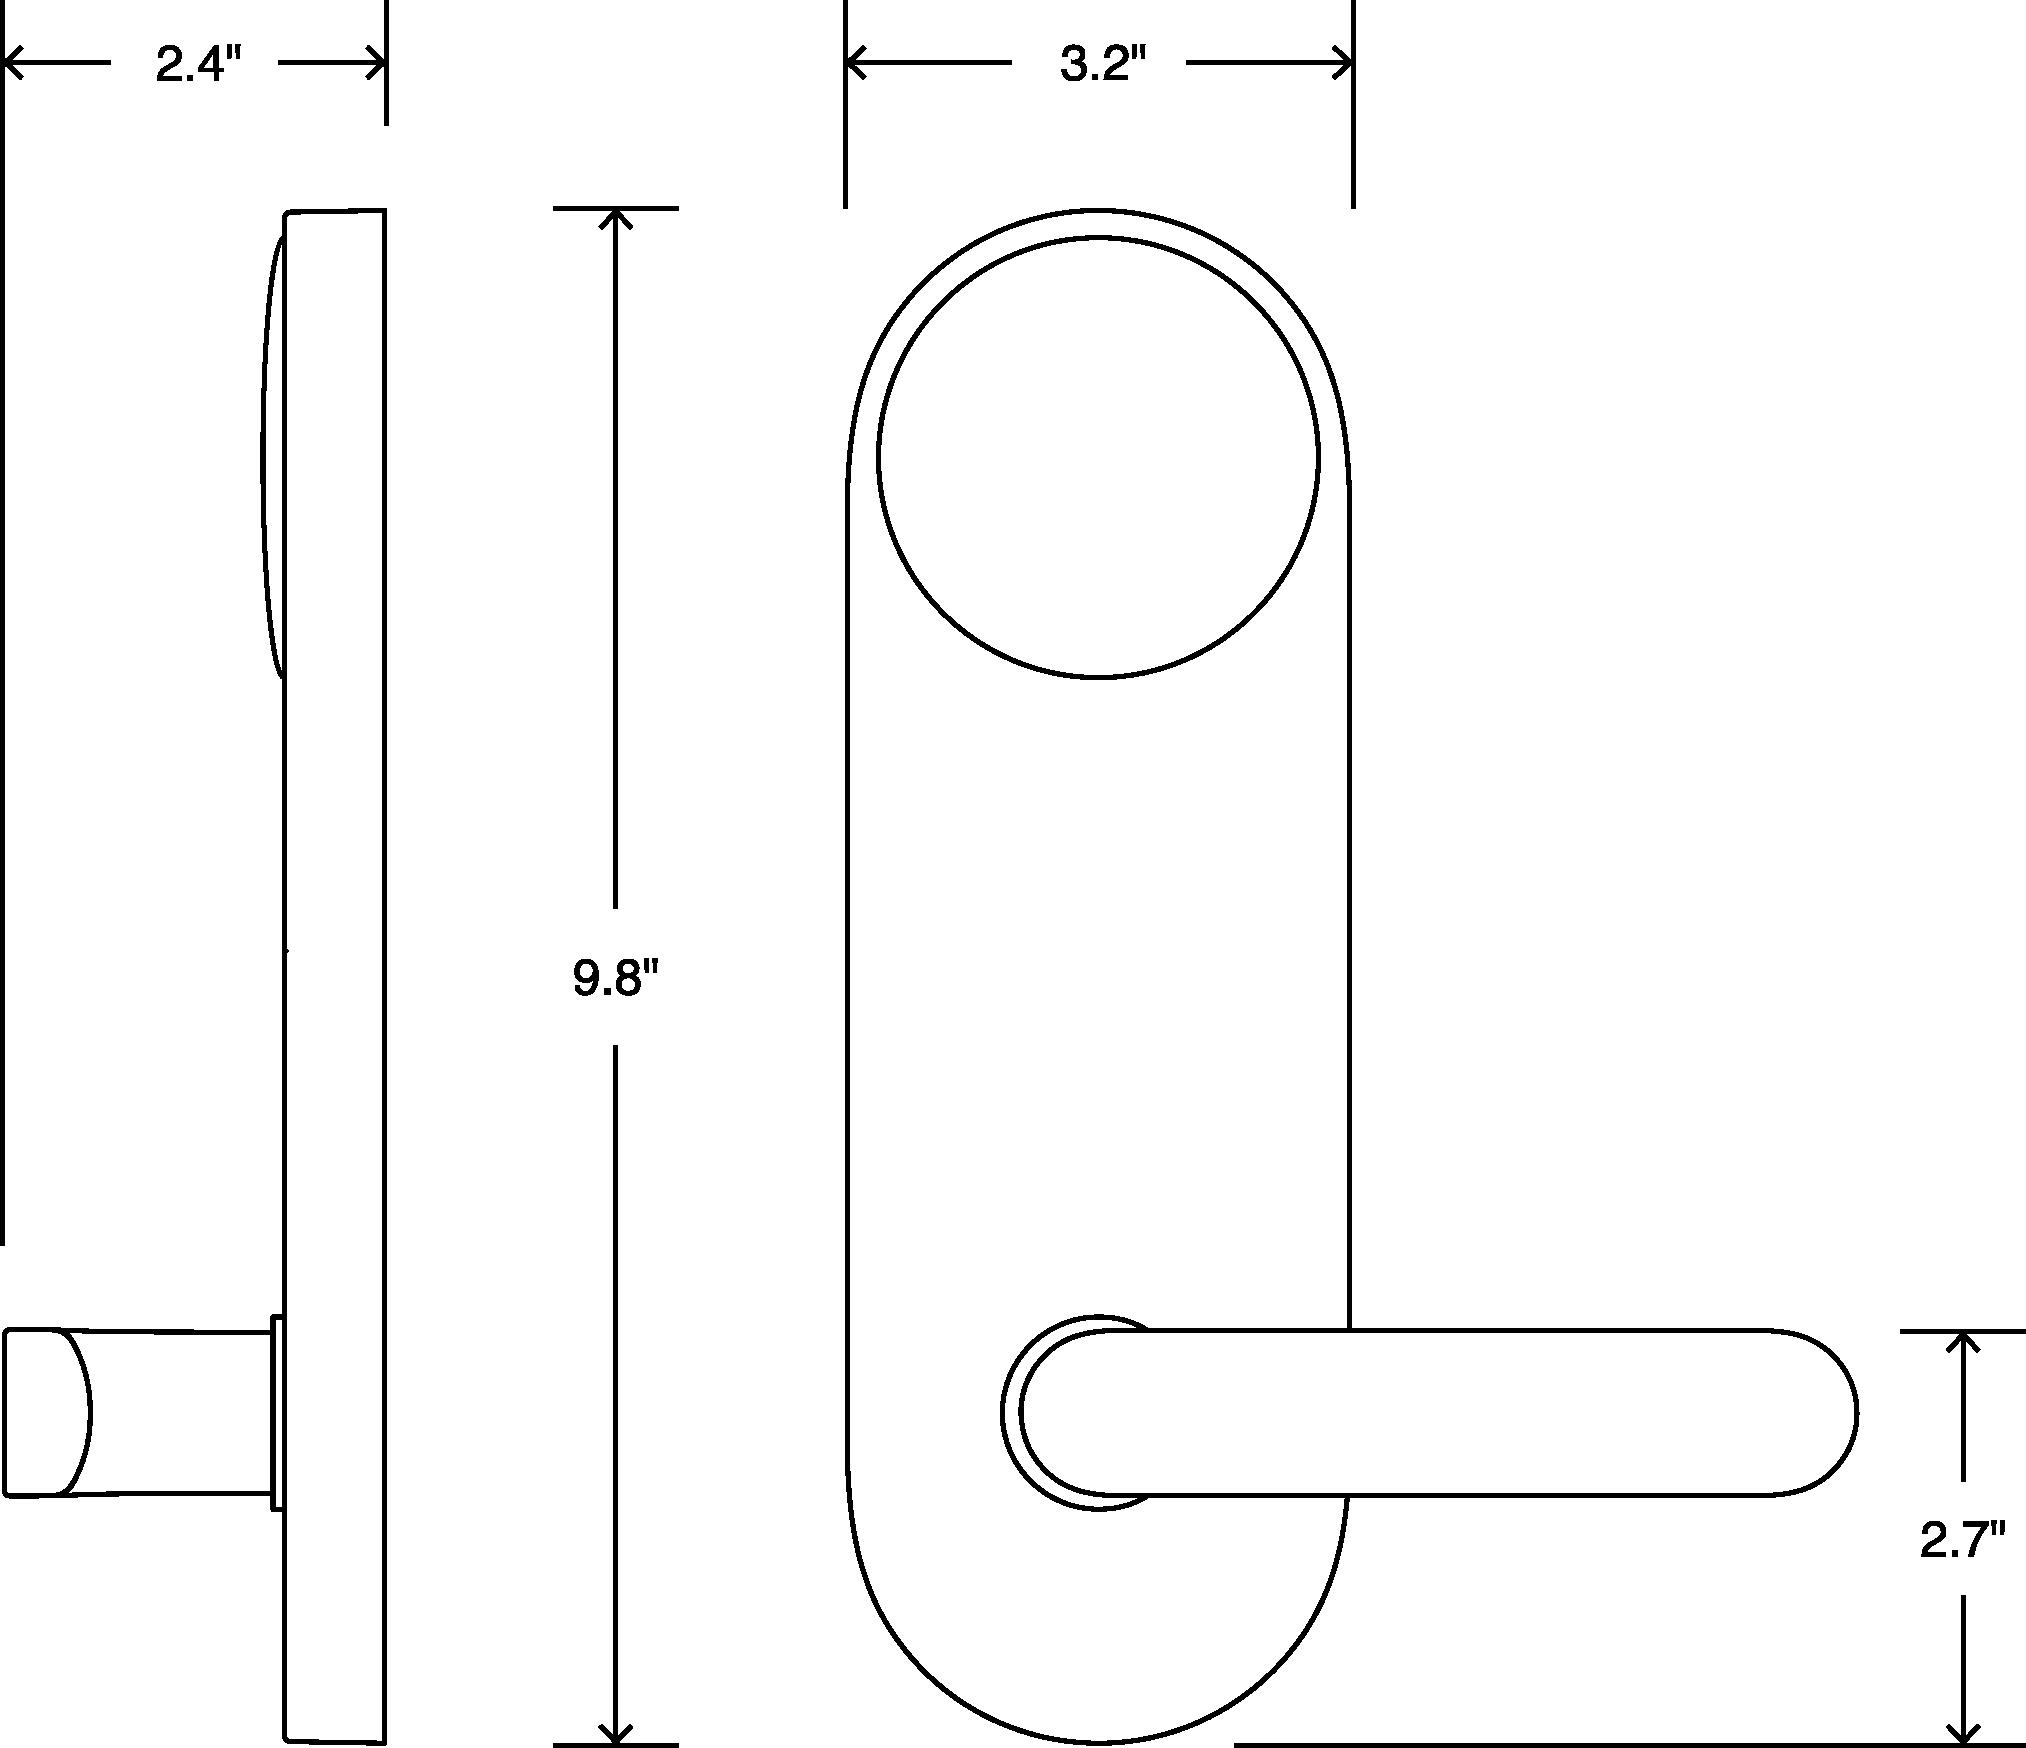 Latch M hardware dimensions